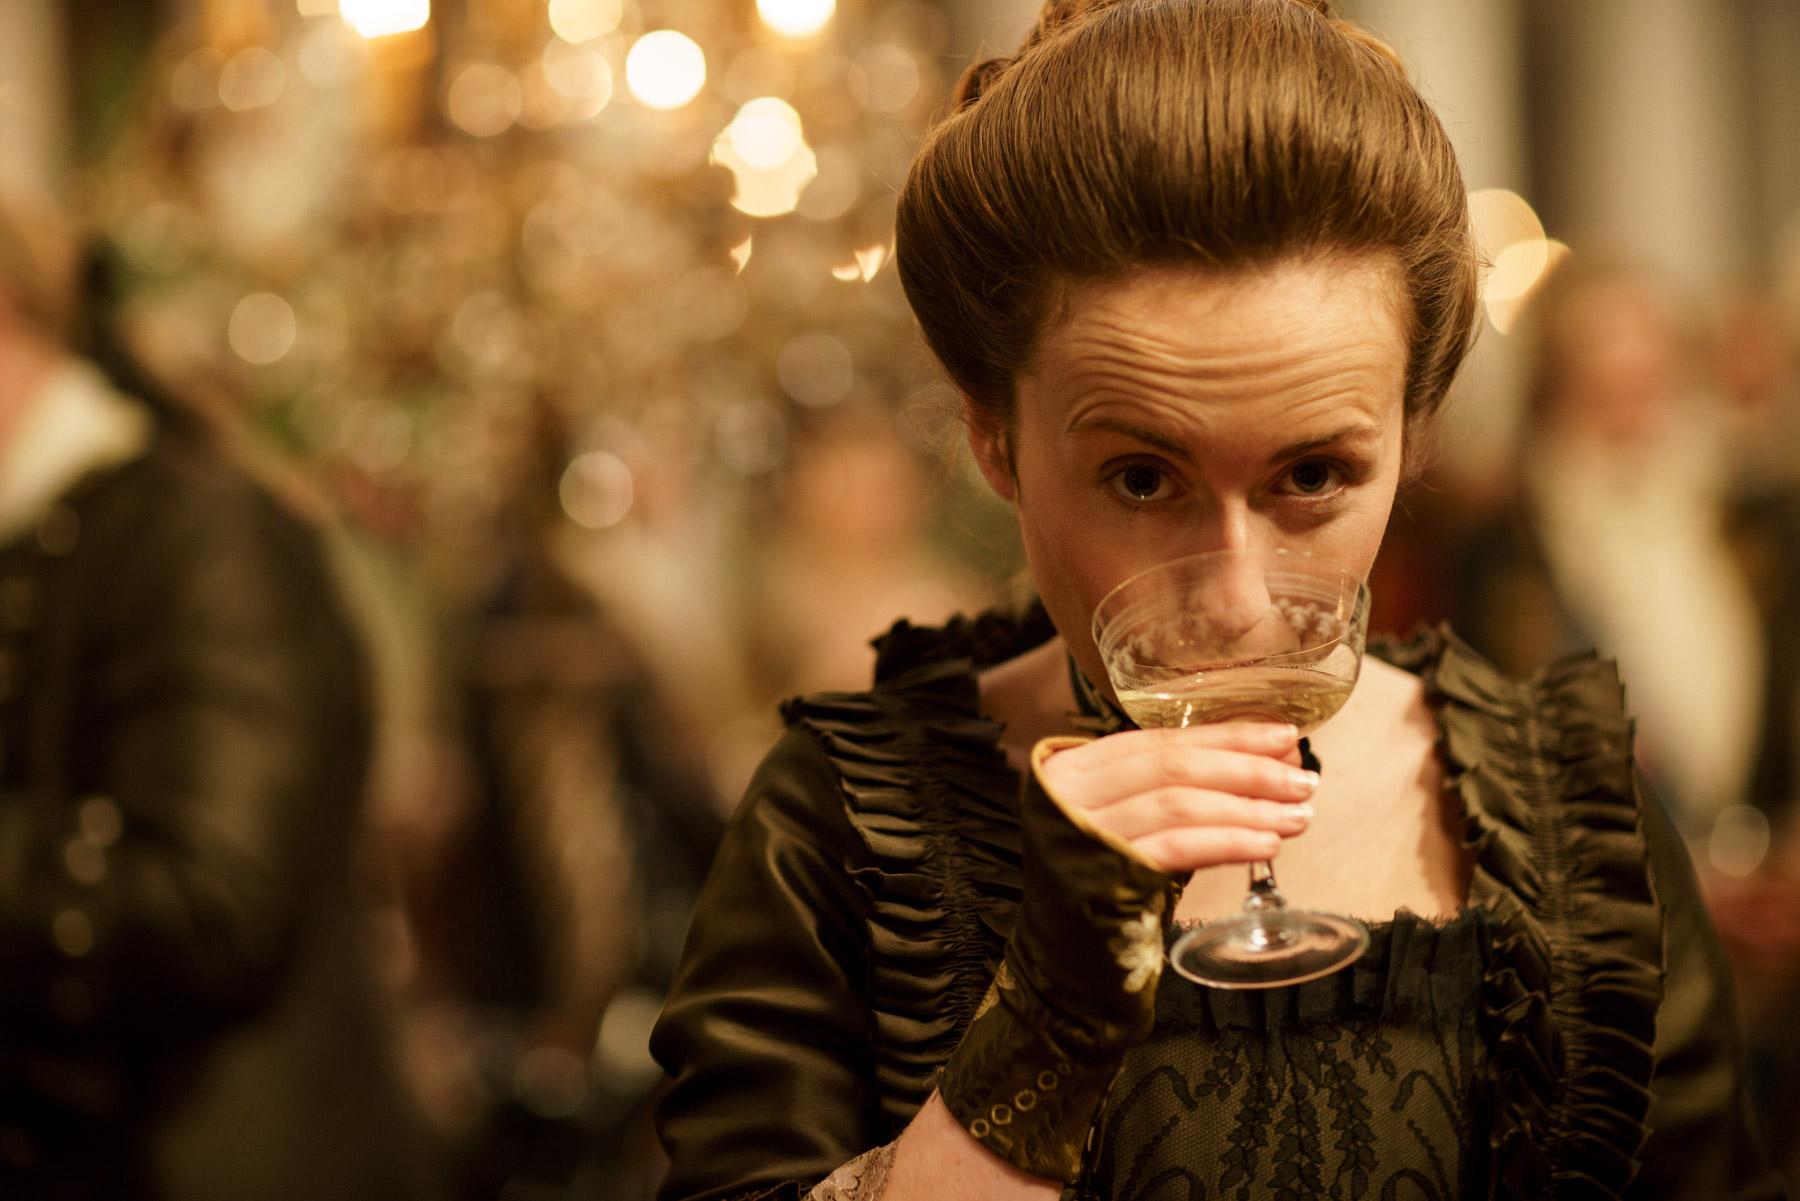 Outlander Season 3 - Behind the scenes